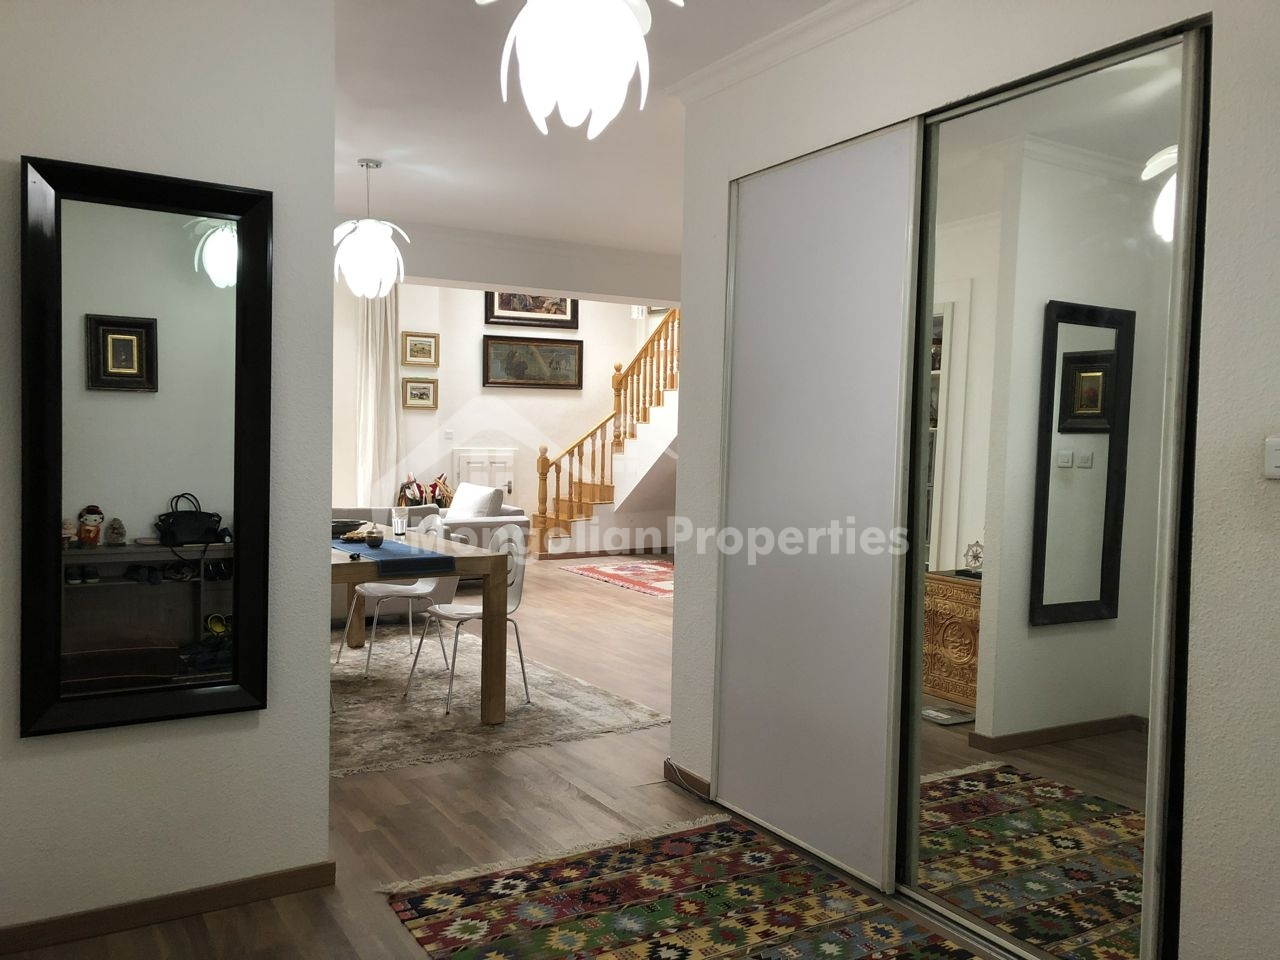 A stunning 4 bedroom duplex apartment